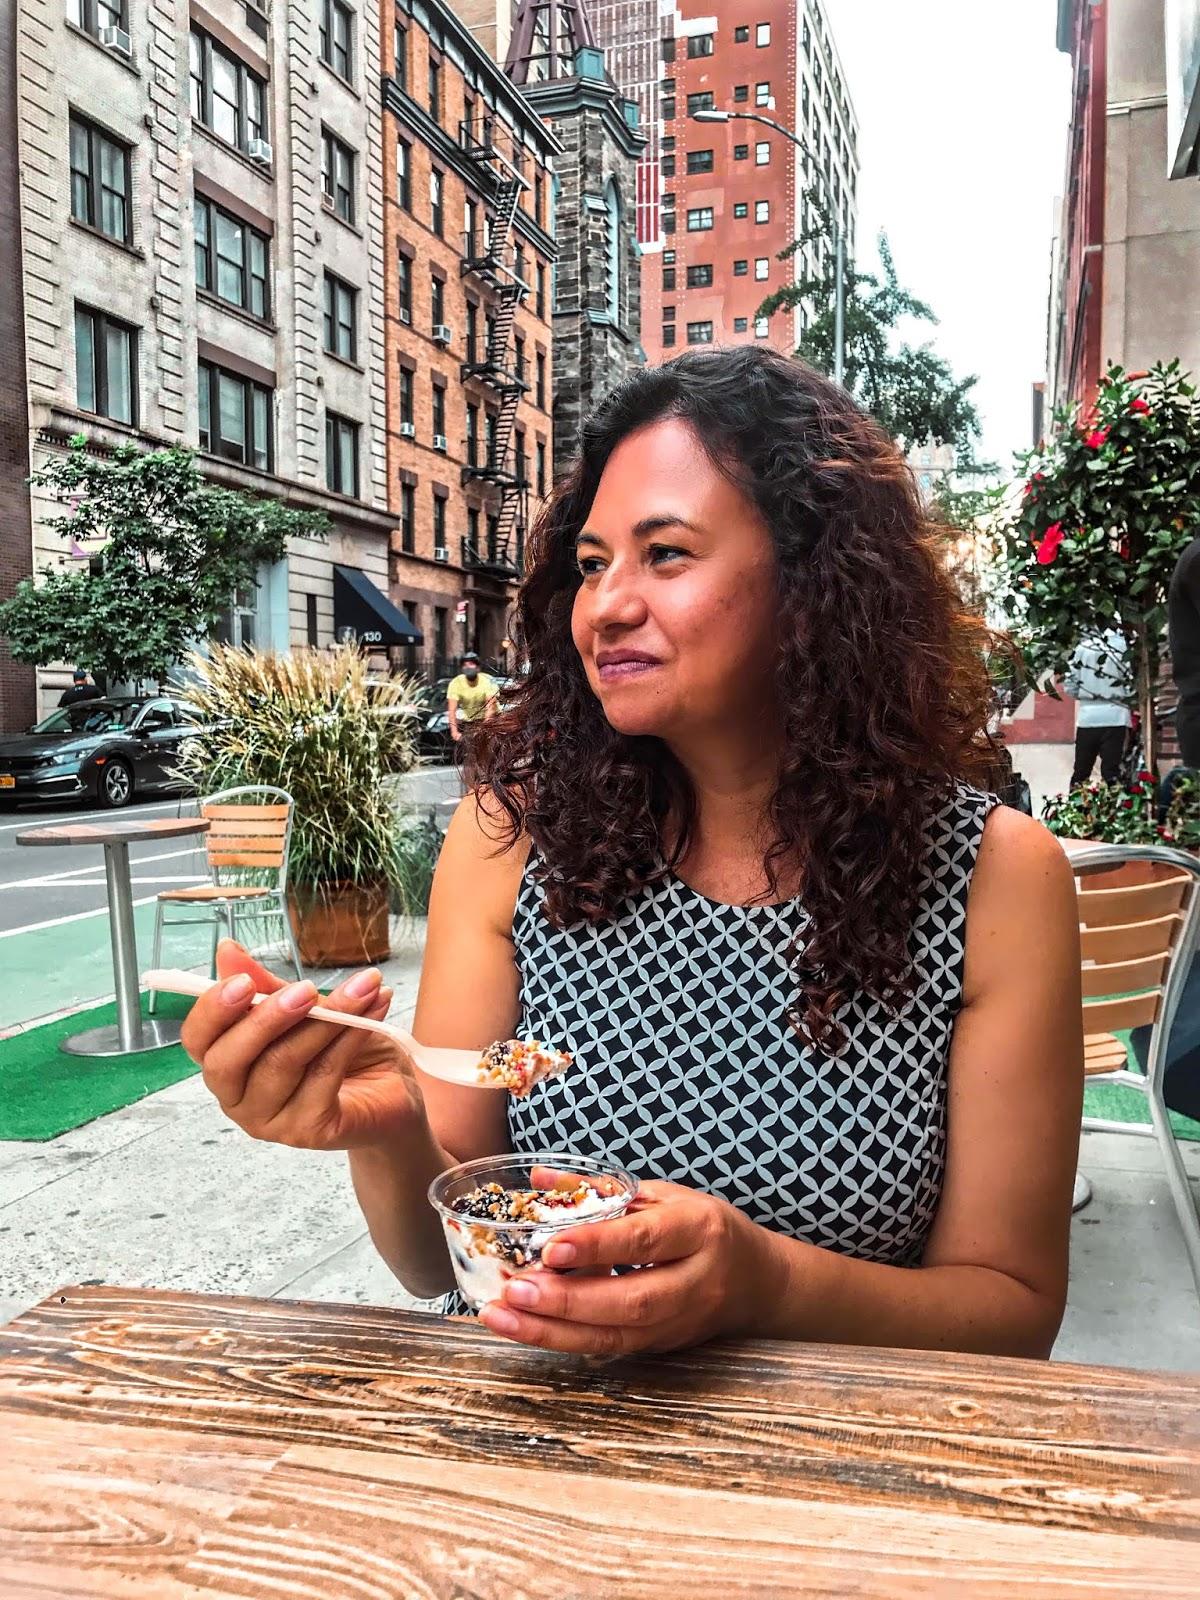 iSouvlaki NYC Outdoor Dining